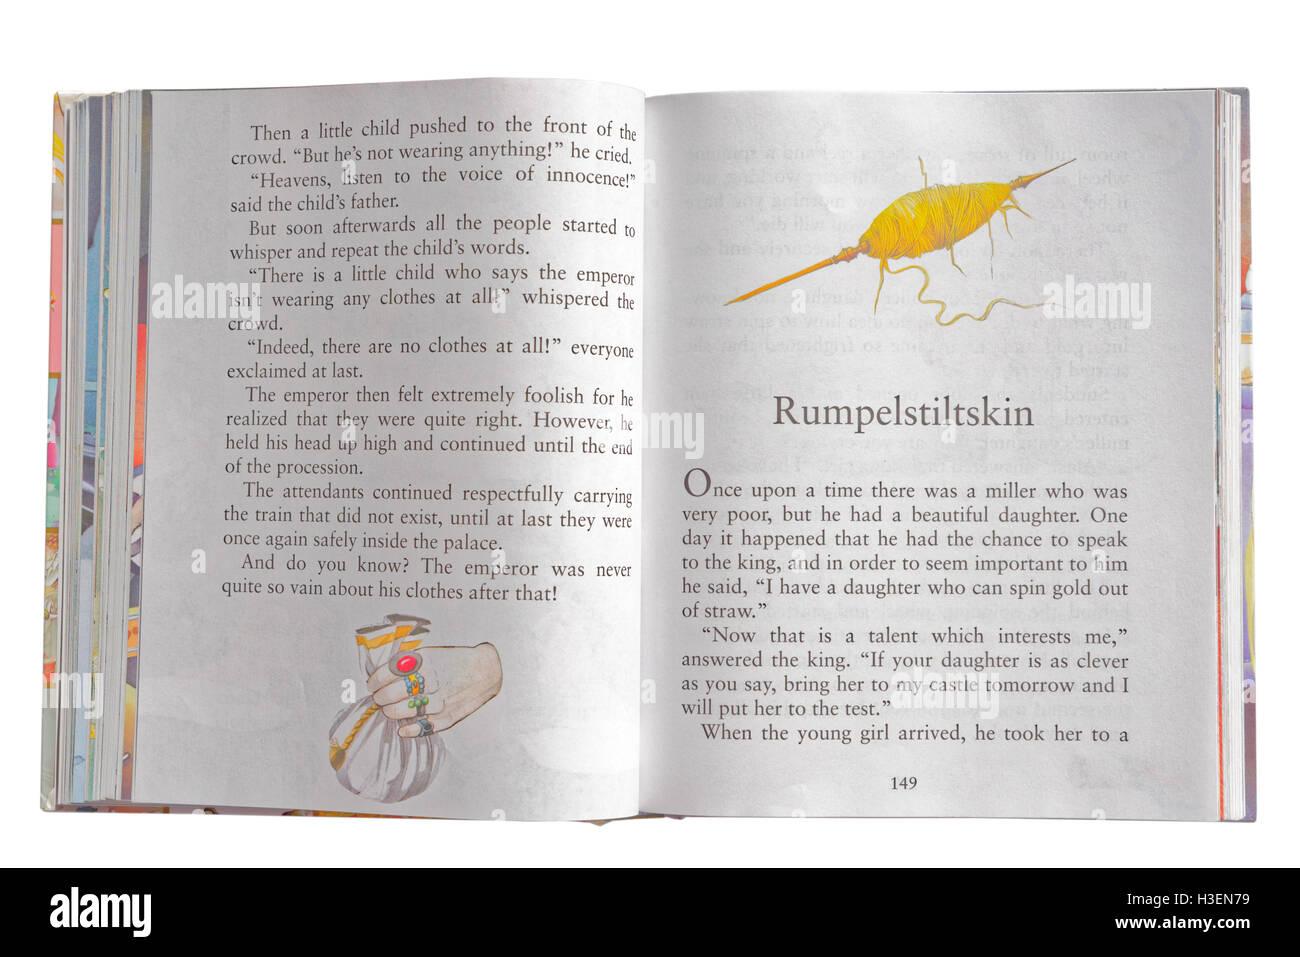 Rumpelstiltskin in a book of Fairy Tales - Stock Image